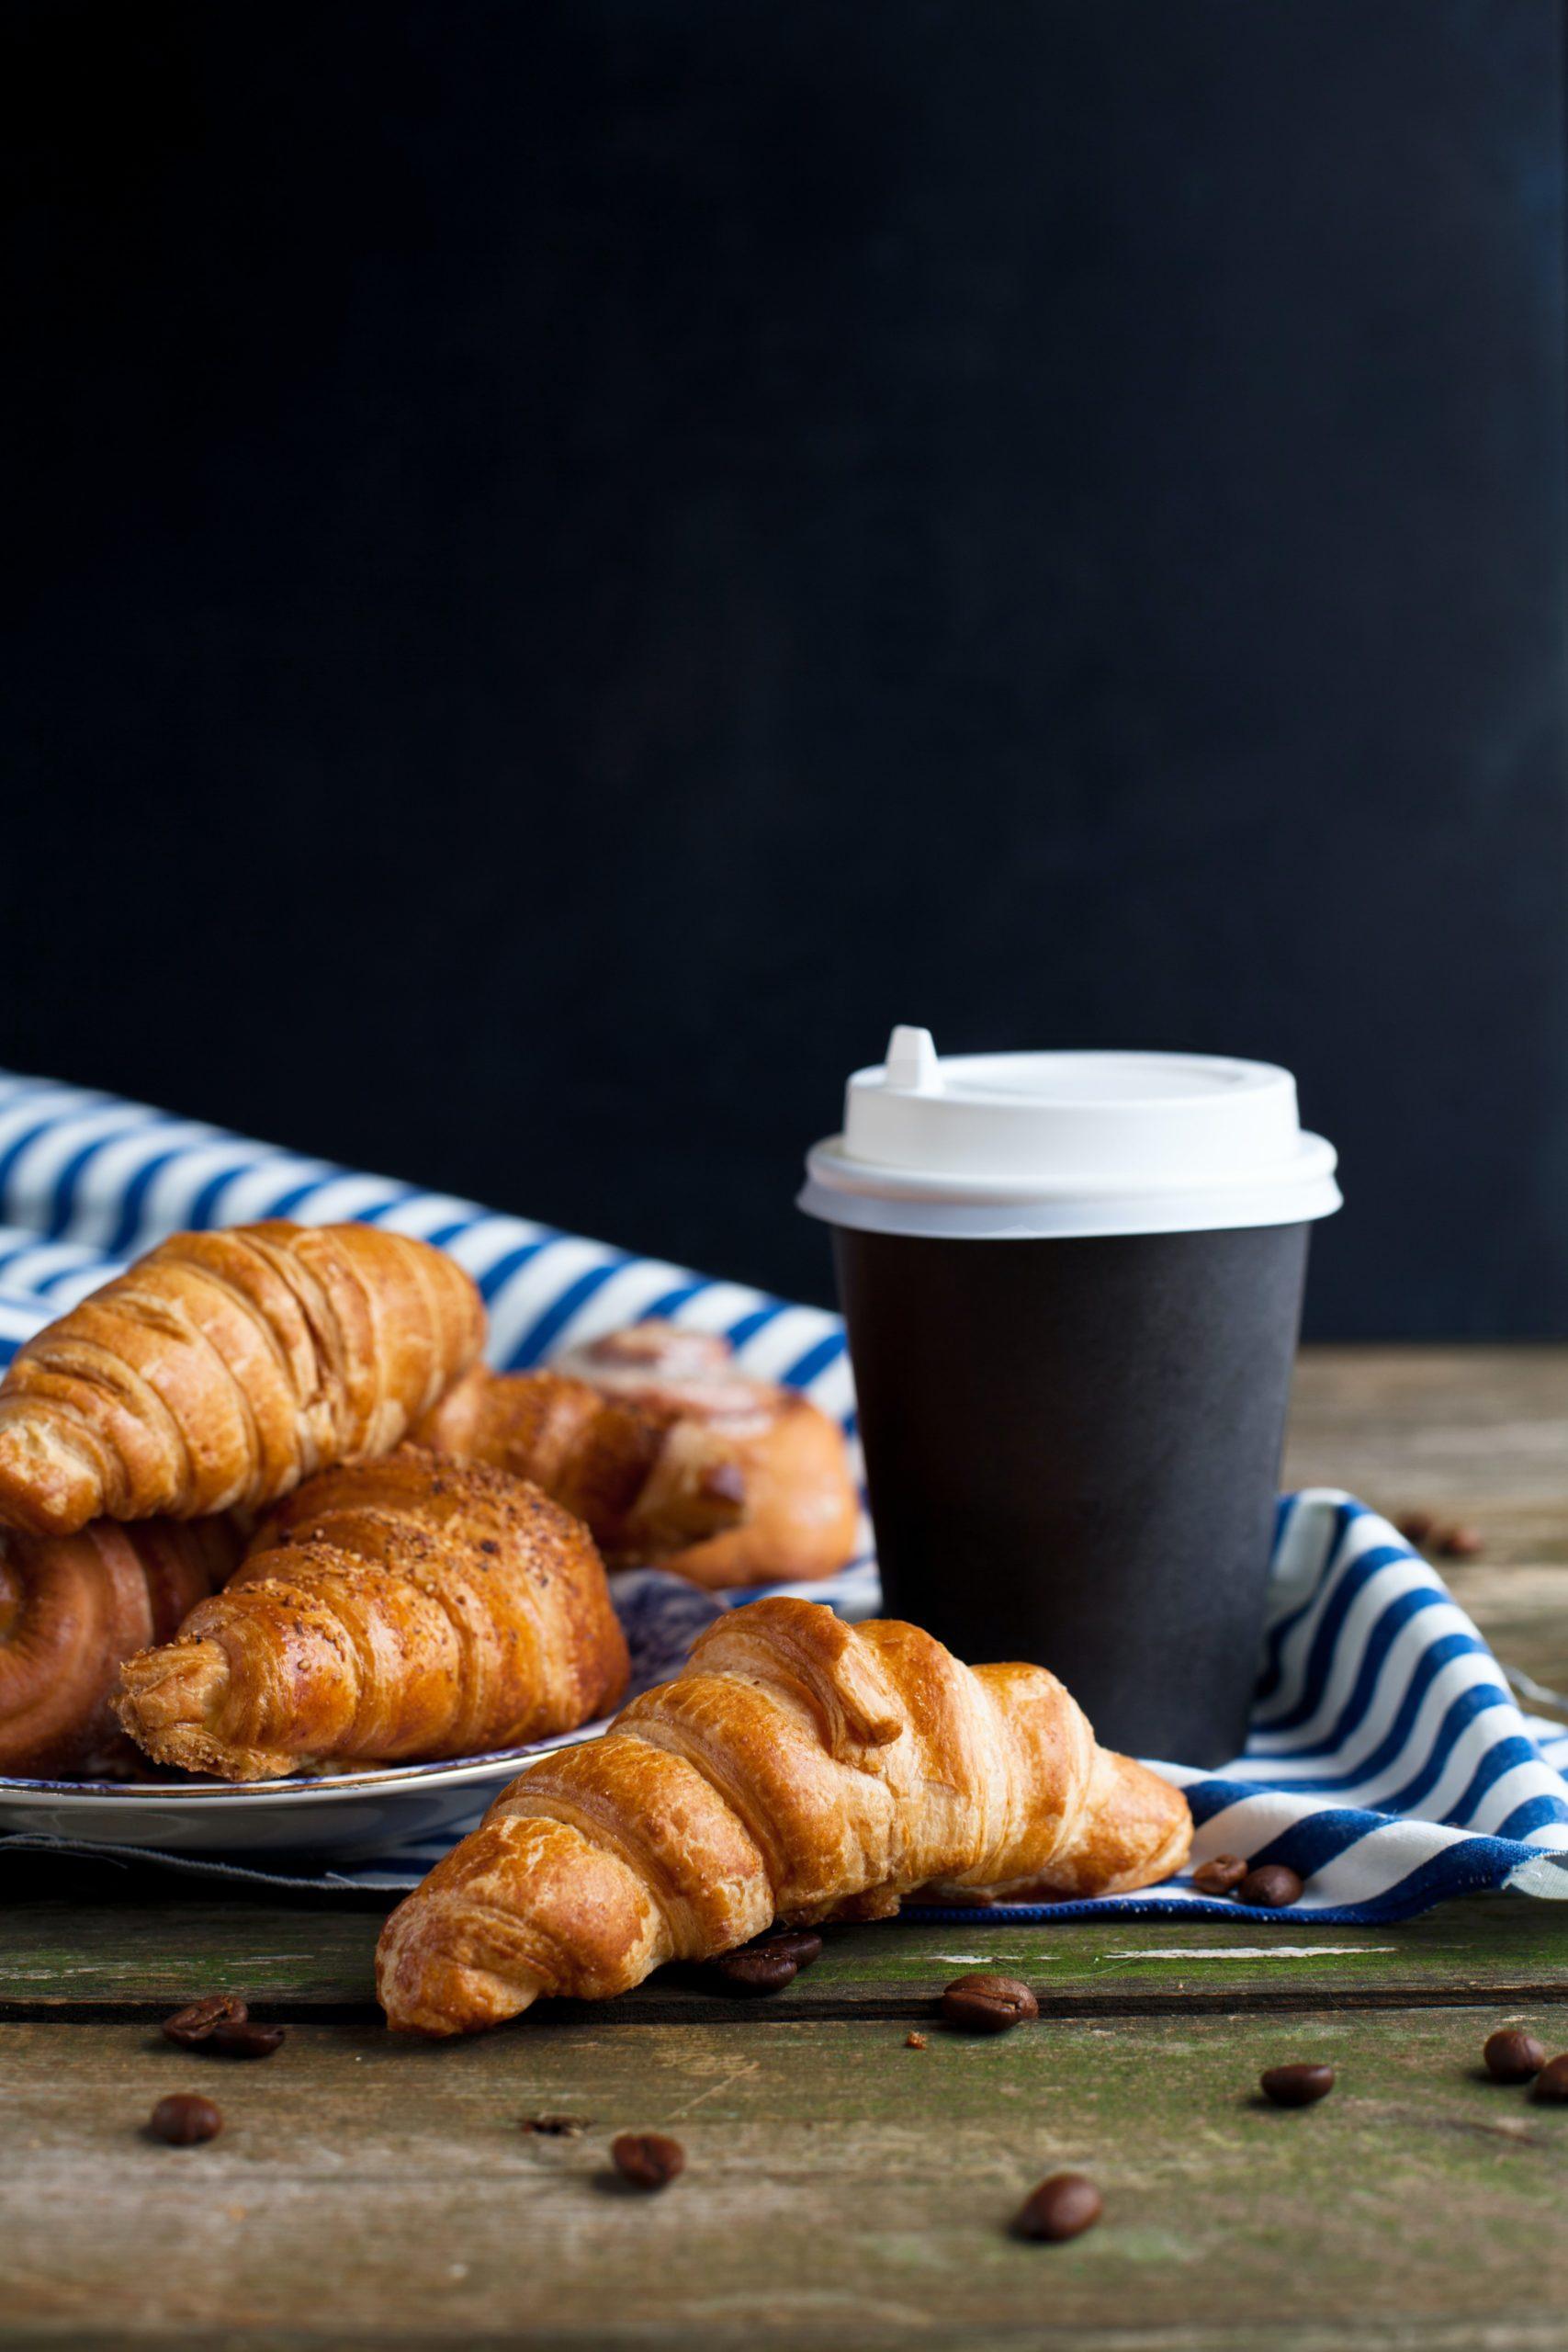 koffie en croissants